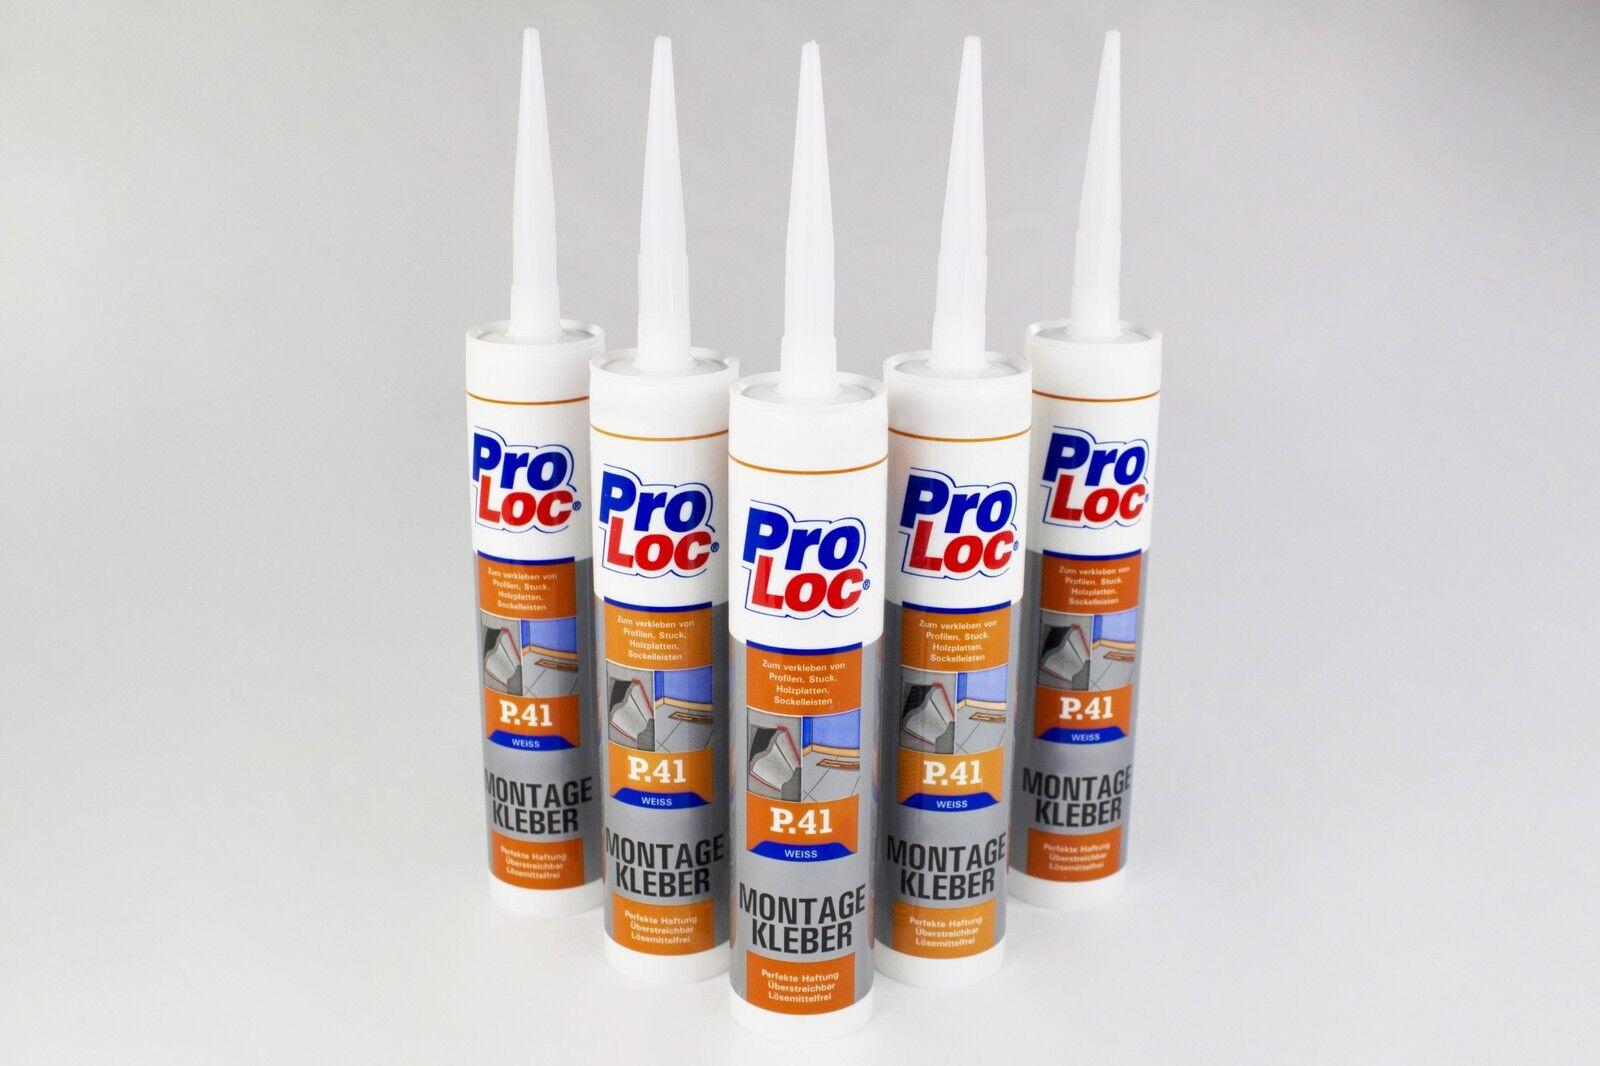 5 Kartuschen Montagekleber Baukleber Kleber hohe Haftung Frostfest ProLoc P41